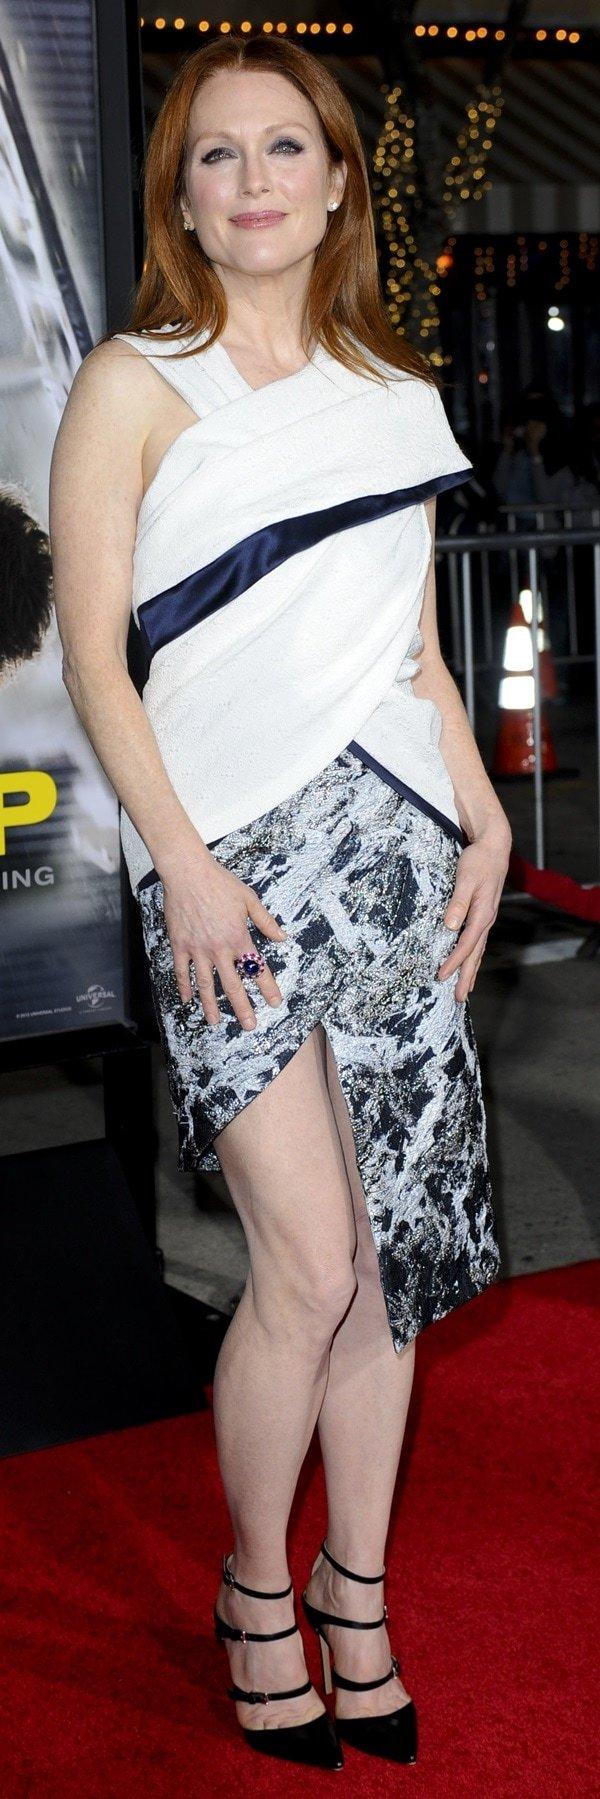 Julianne Moore revealed her bare hot legs ina finely draped Prabal Gurung Fall 2014 dress